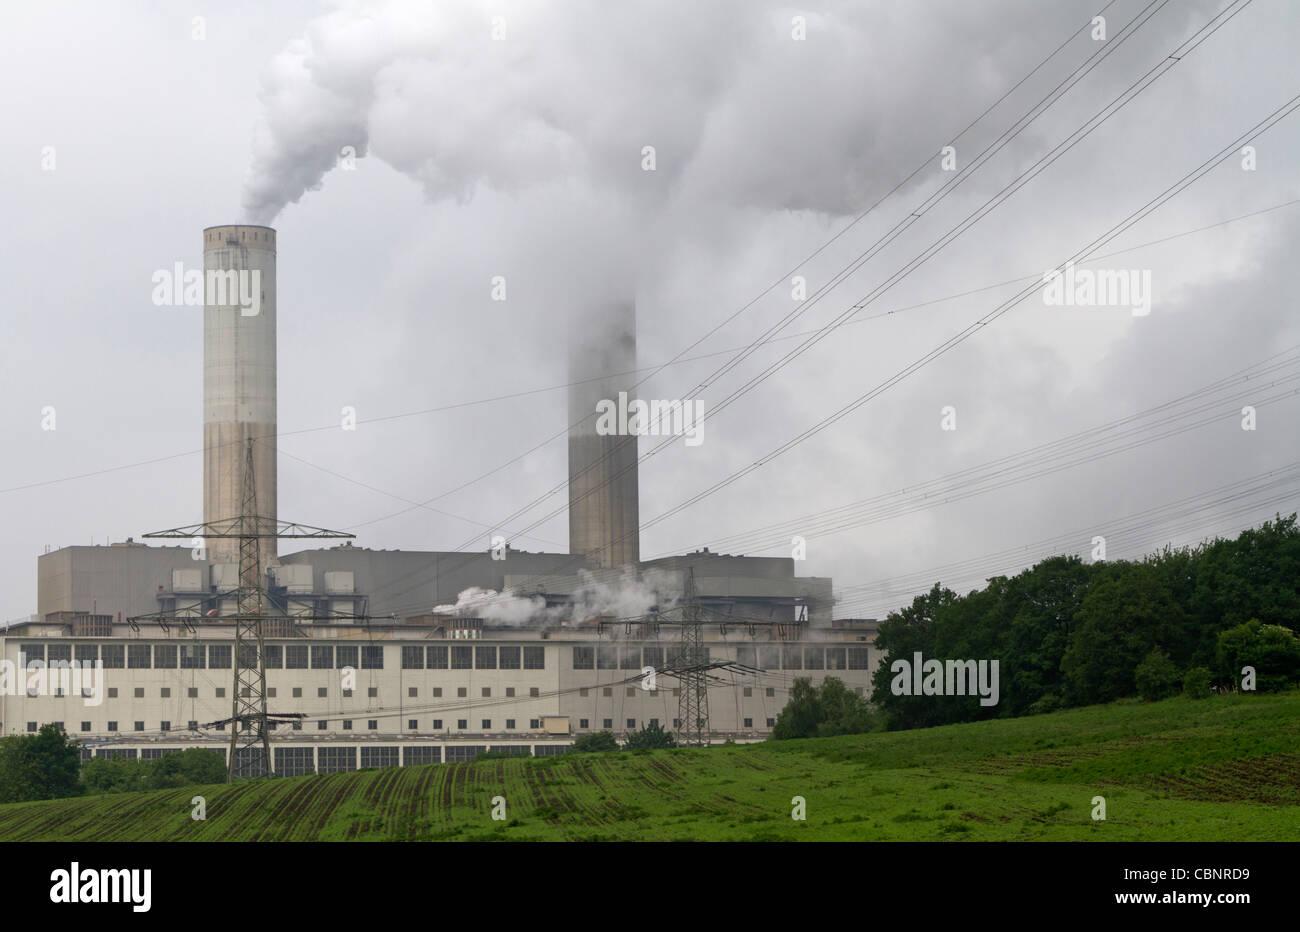 Generating plant Frimmersdorf, Germany - Stock Image